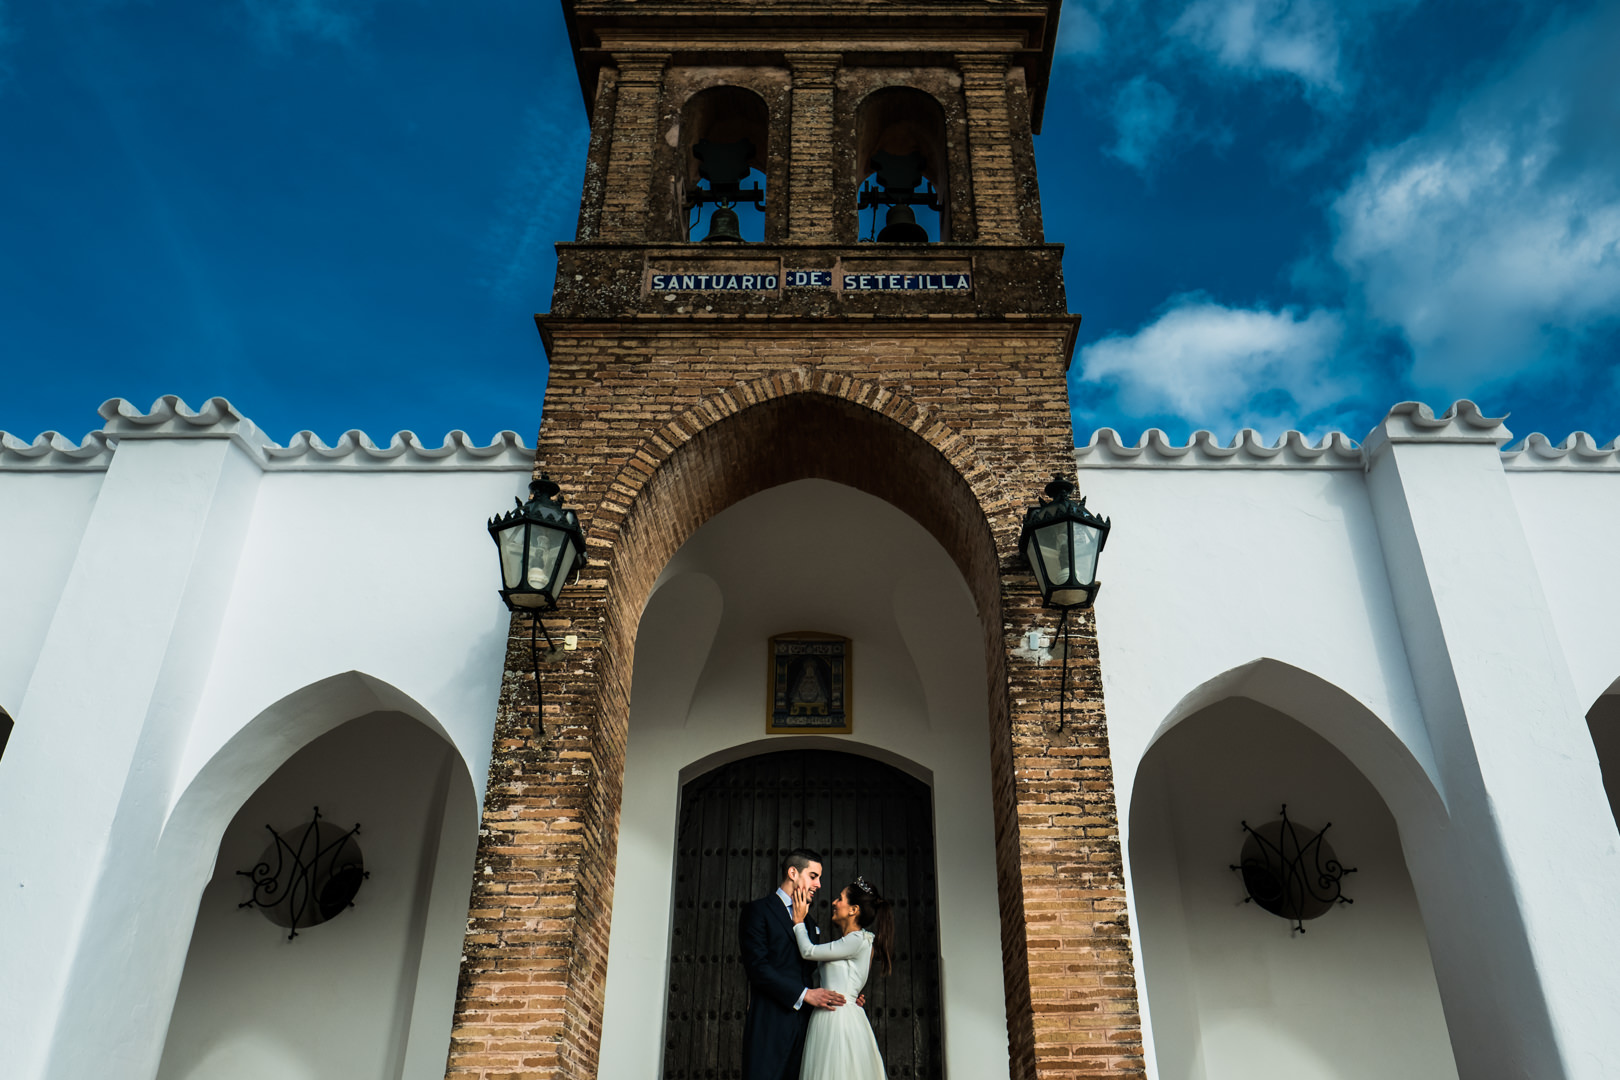 Boda-sevilla-Wedding-engagement-Rafael-Torres-fotografo-bodas-sevilla-madrid-barcelona-wedding-photographer--1-3.jpg